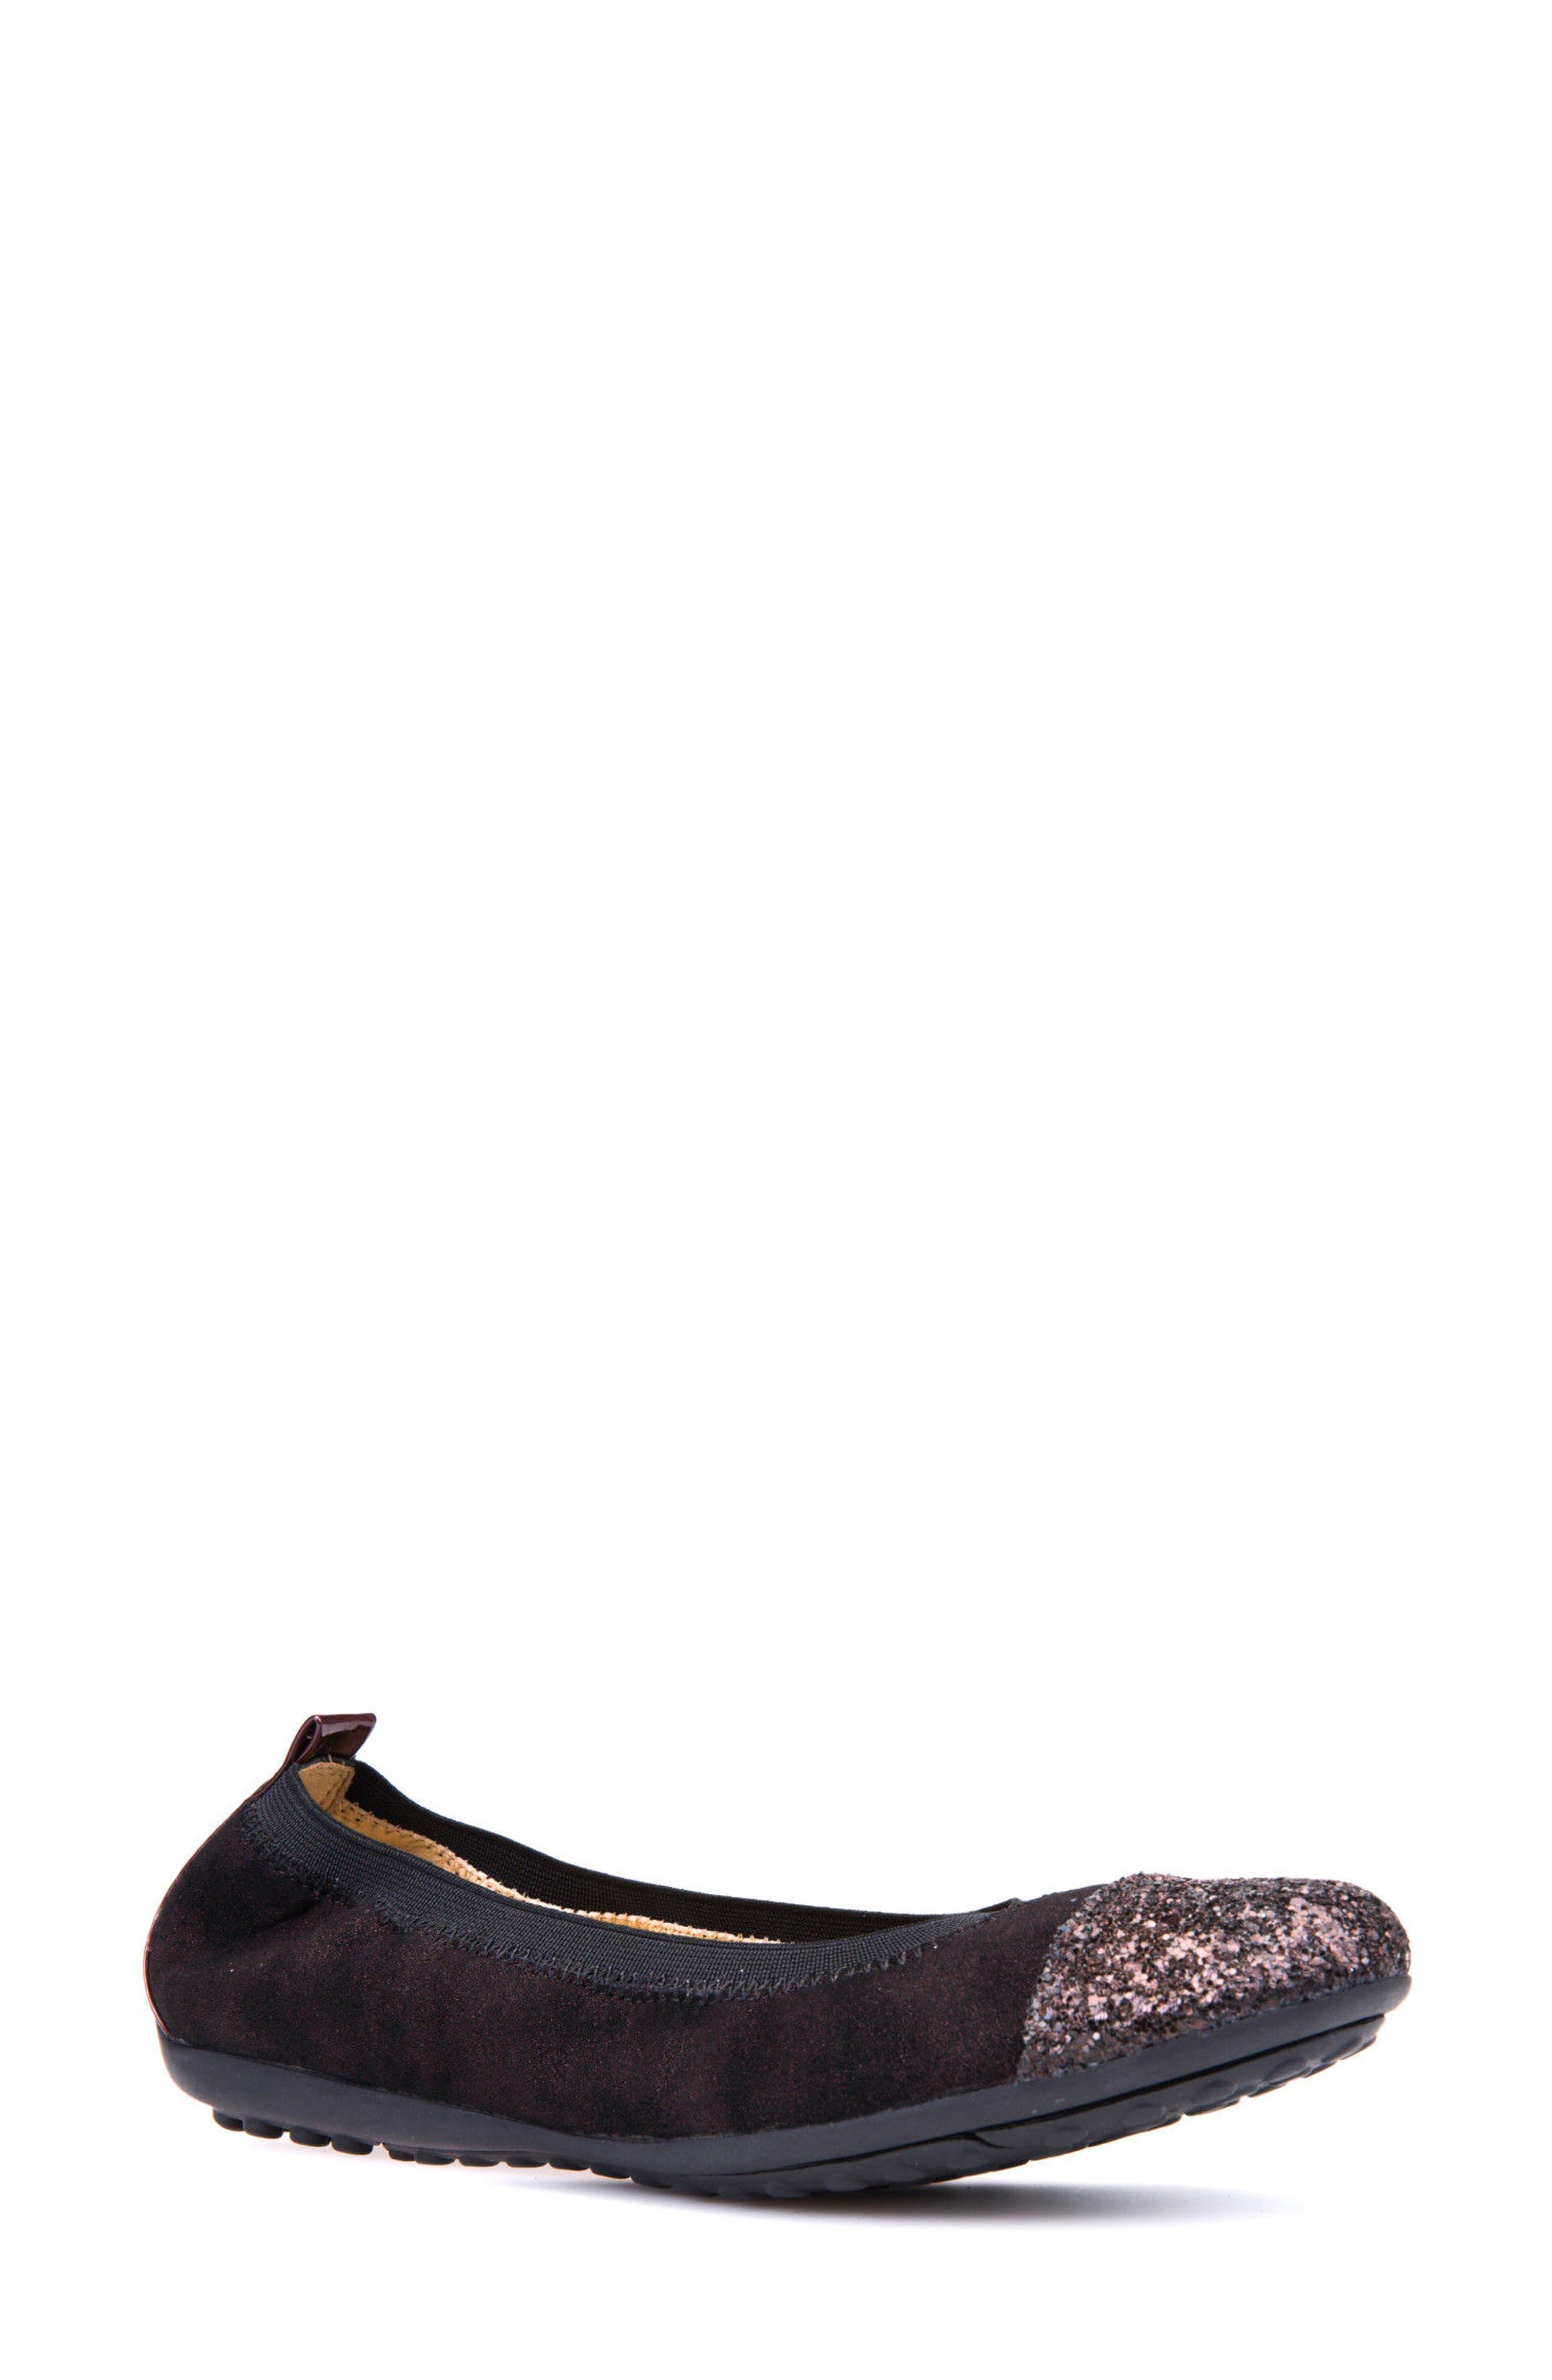 Geox Piuma Cap Toe Ballet Flat (Women)